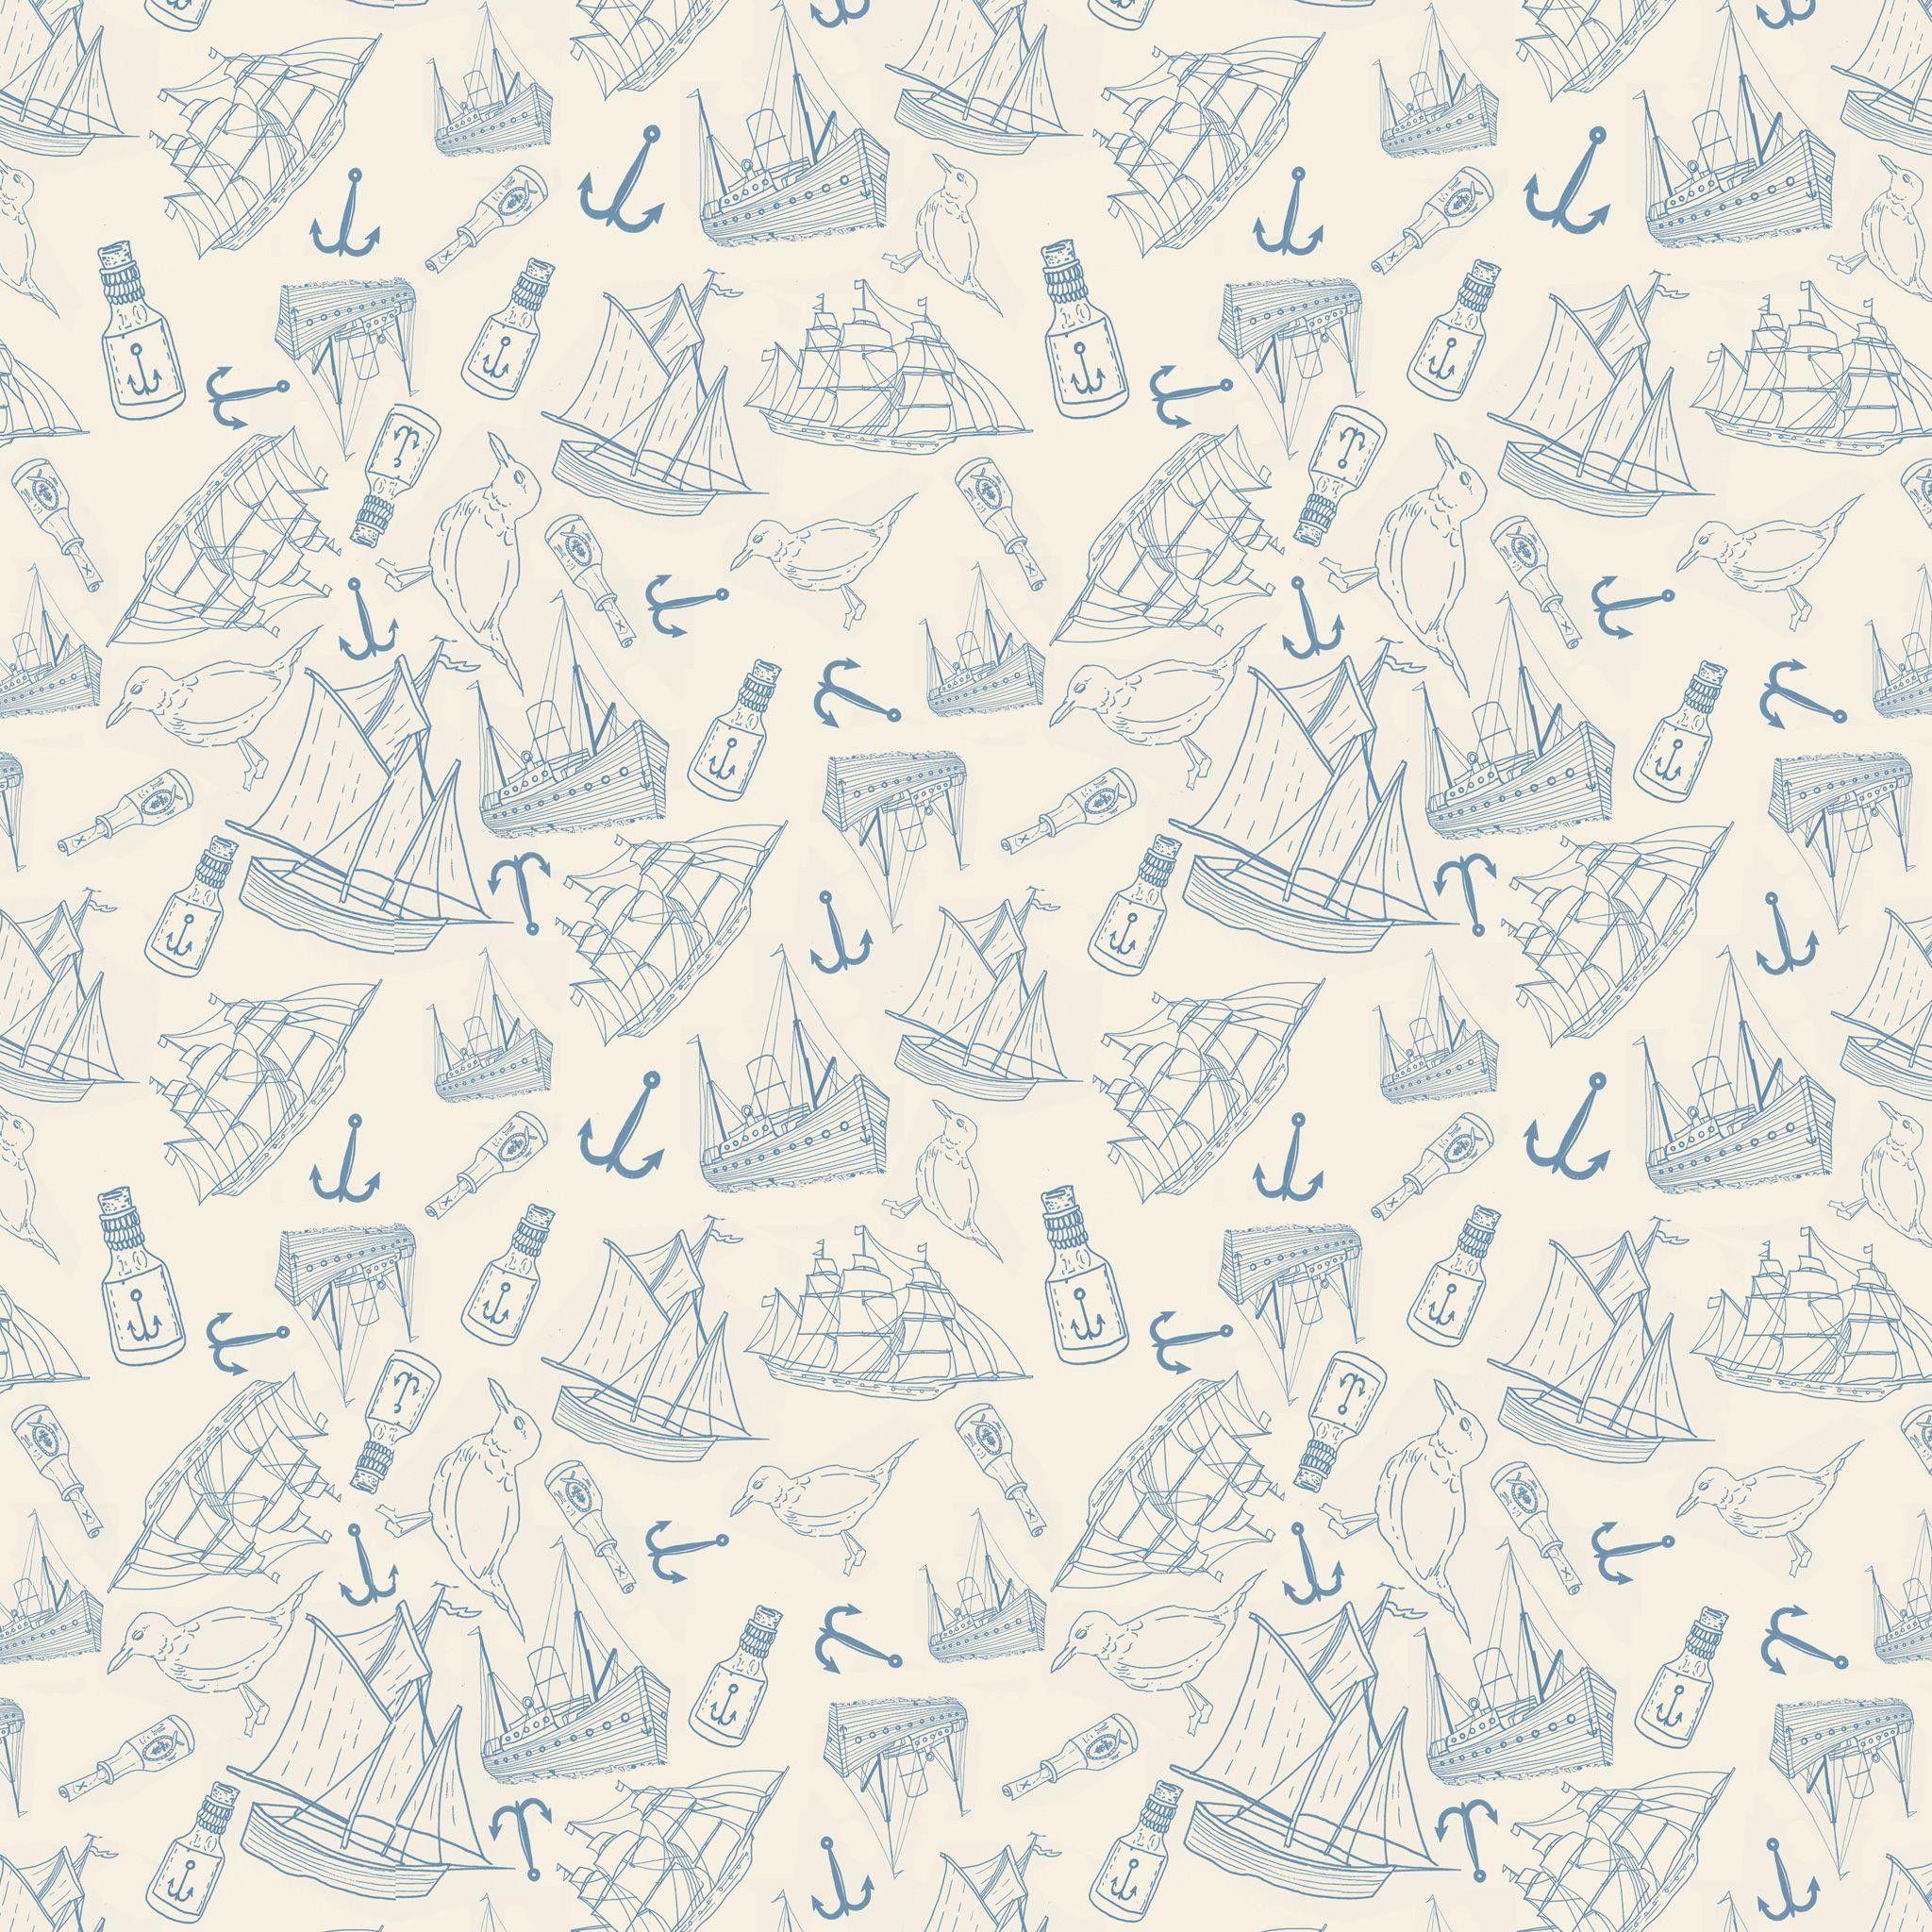 Nautical Wallpapers   Top Nautical Backgrounds   WallpaperAccess 2048x2048